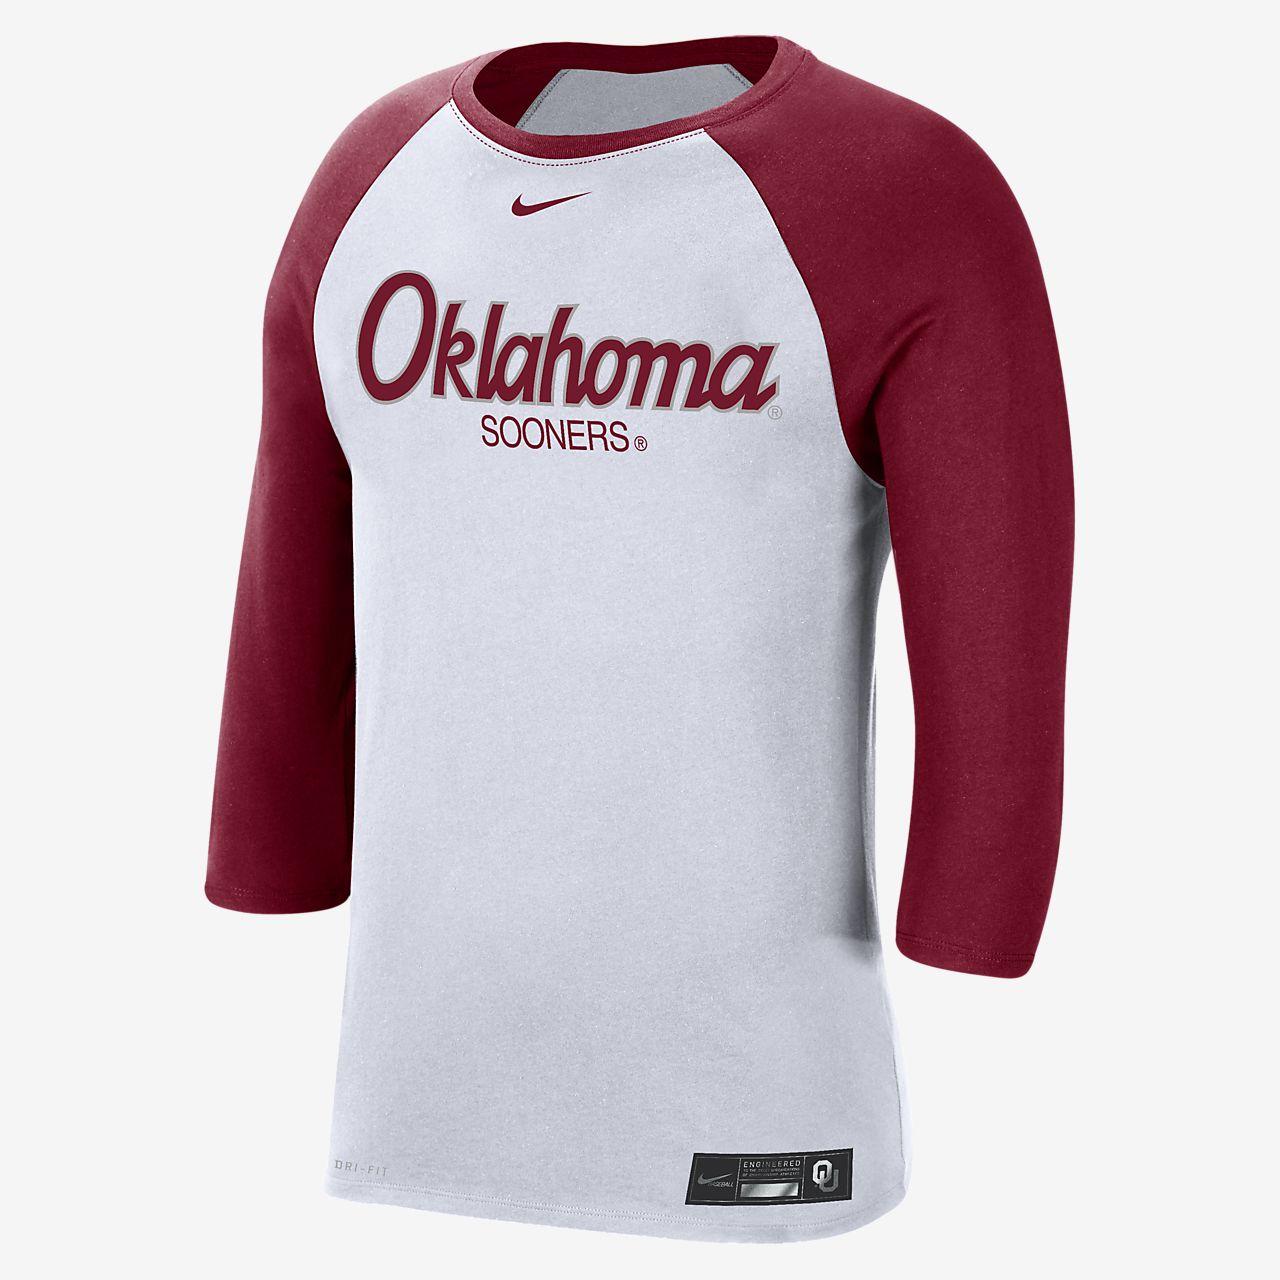 Nike College Dri-FIT (Oklahoma) Men's 3/4-Sleeve T-Shirt